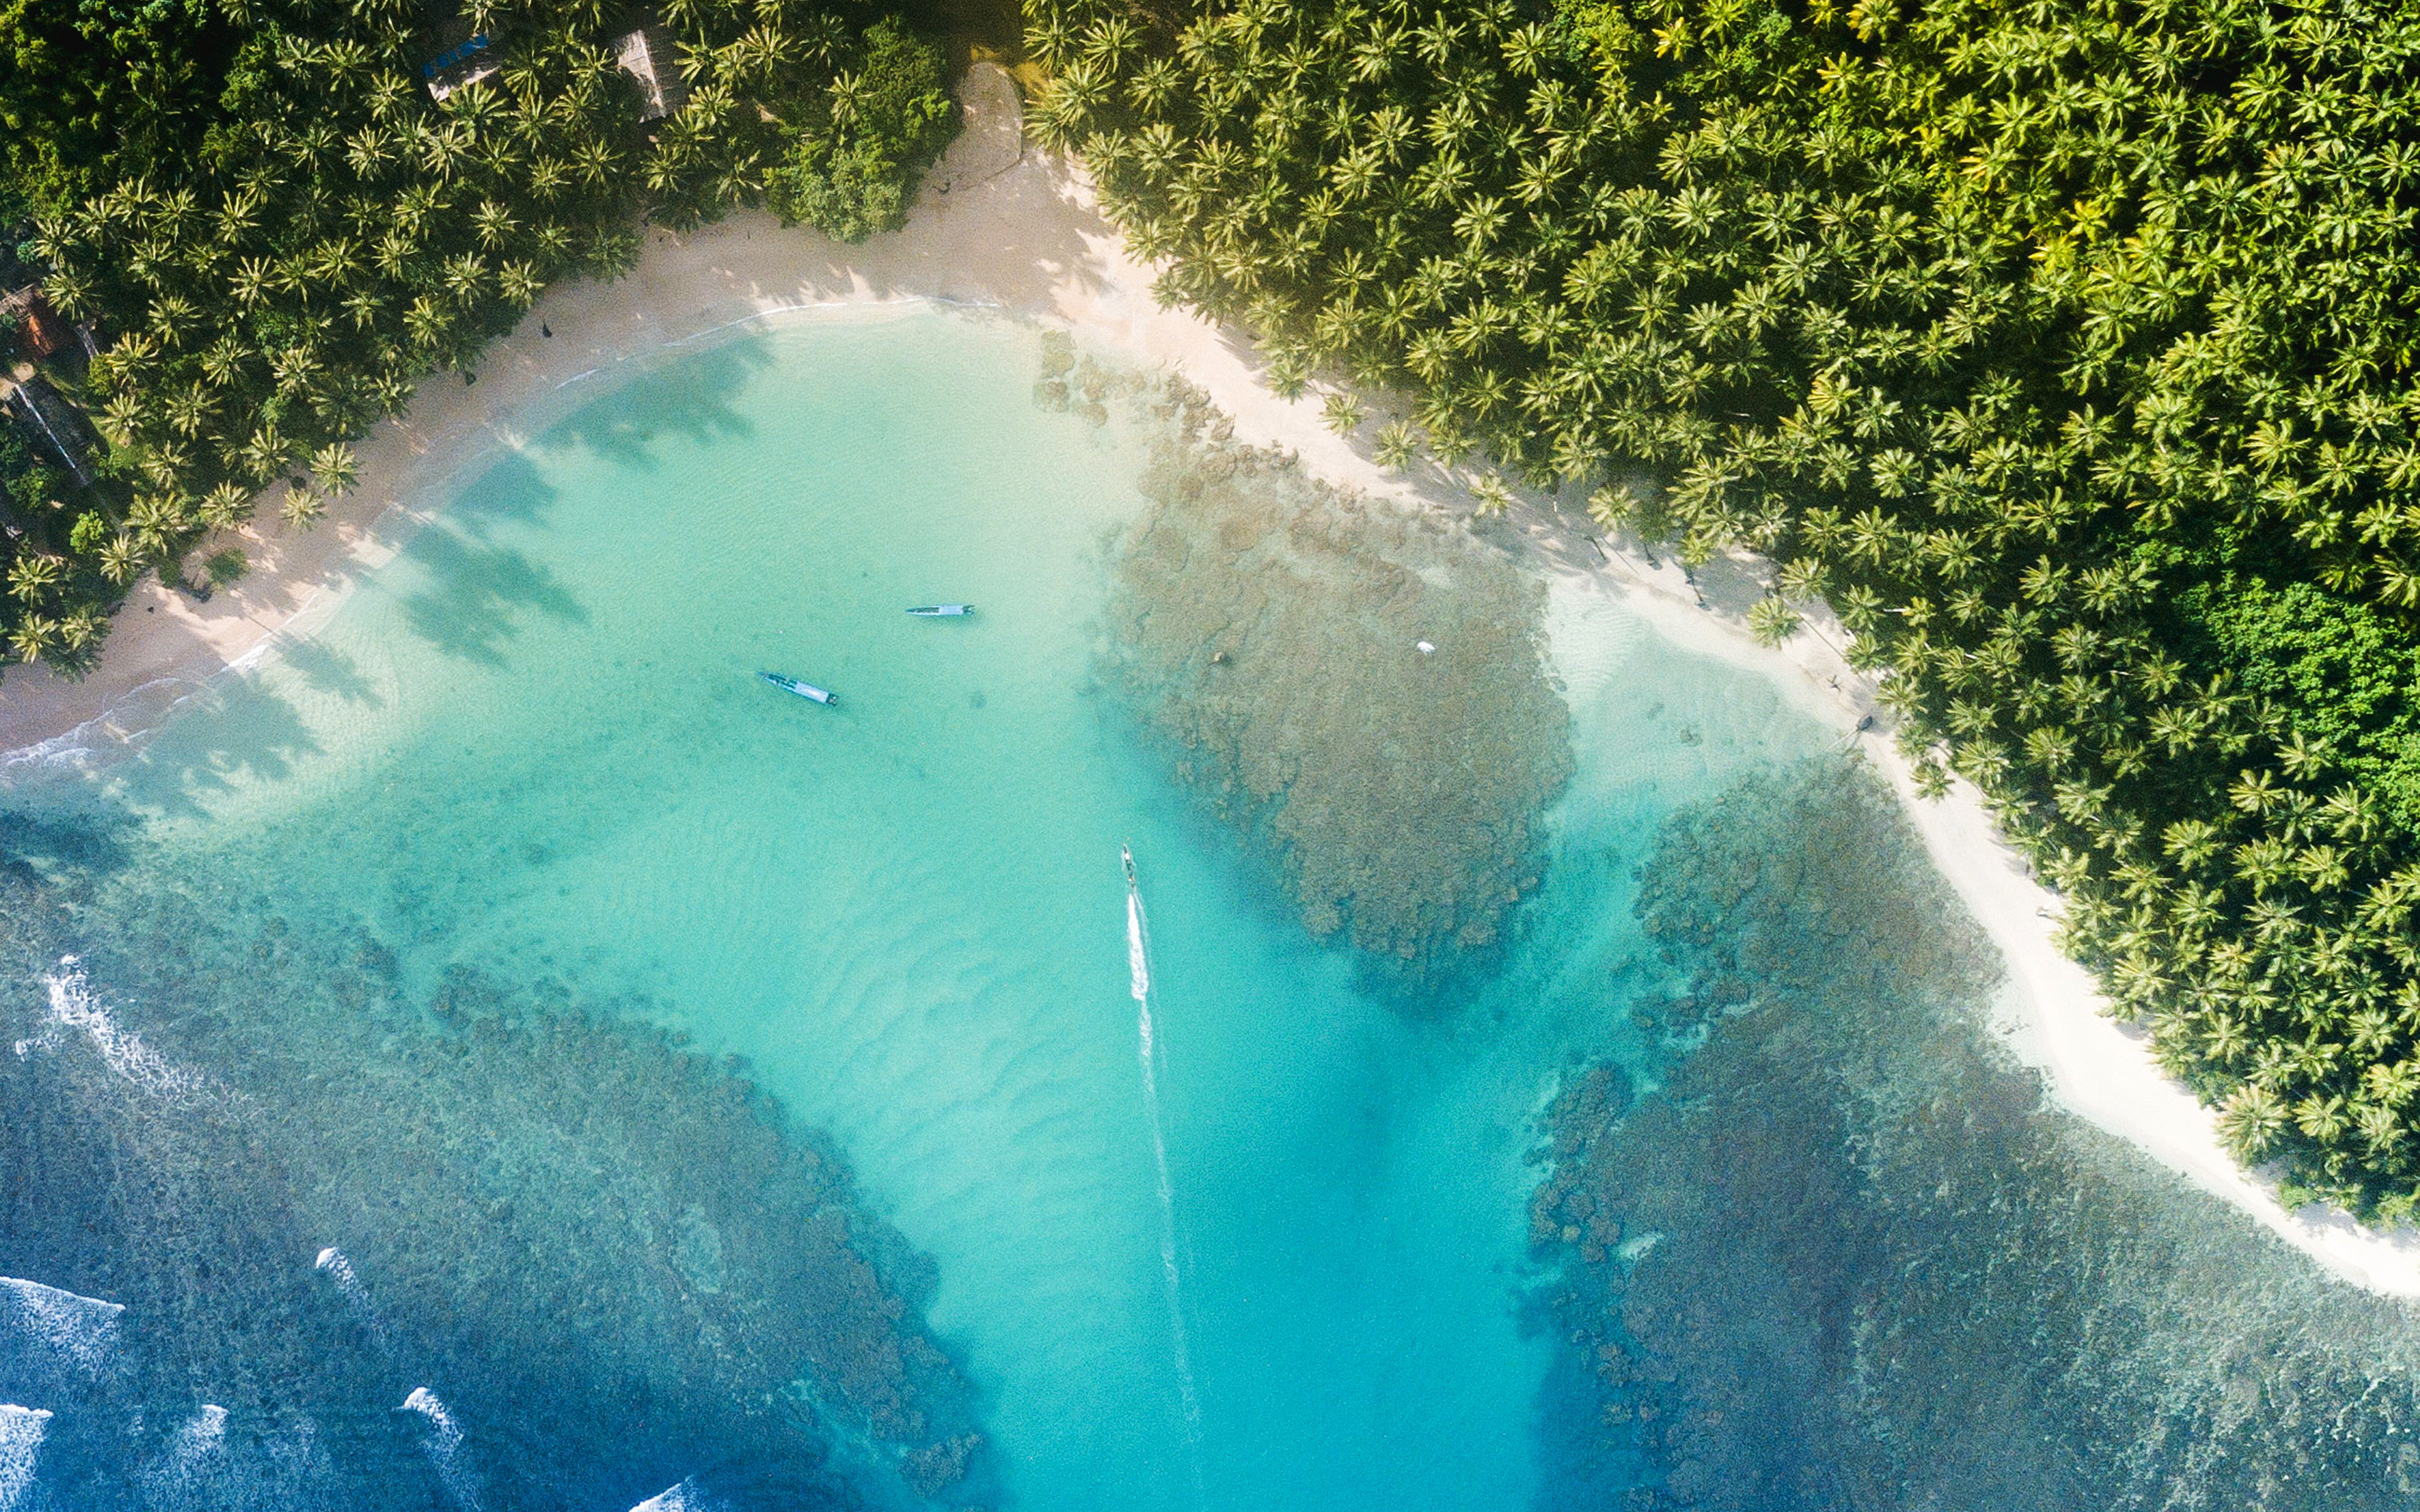 nu19-beach-sea-summer-nature-earthview-wallpaper